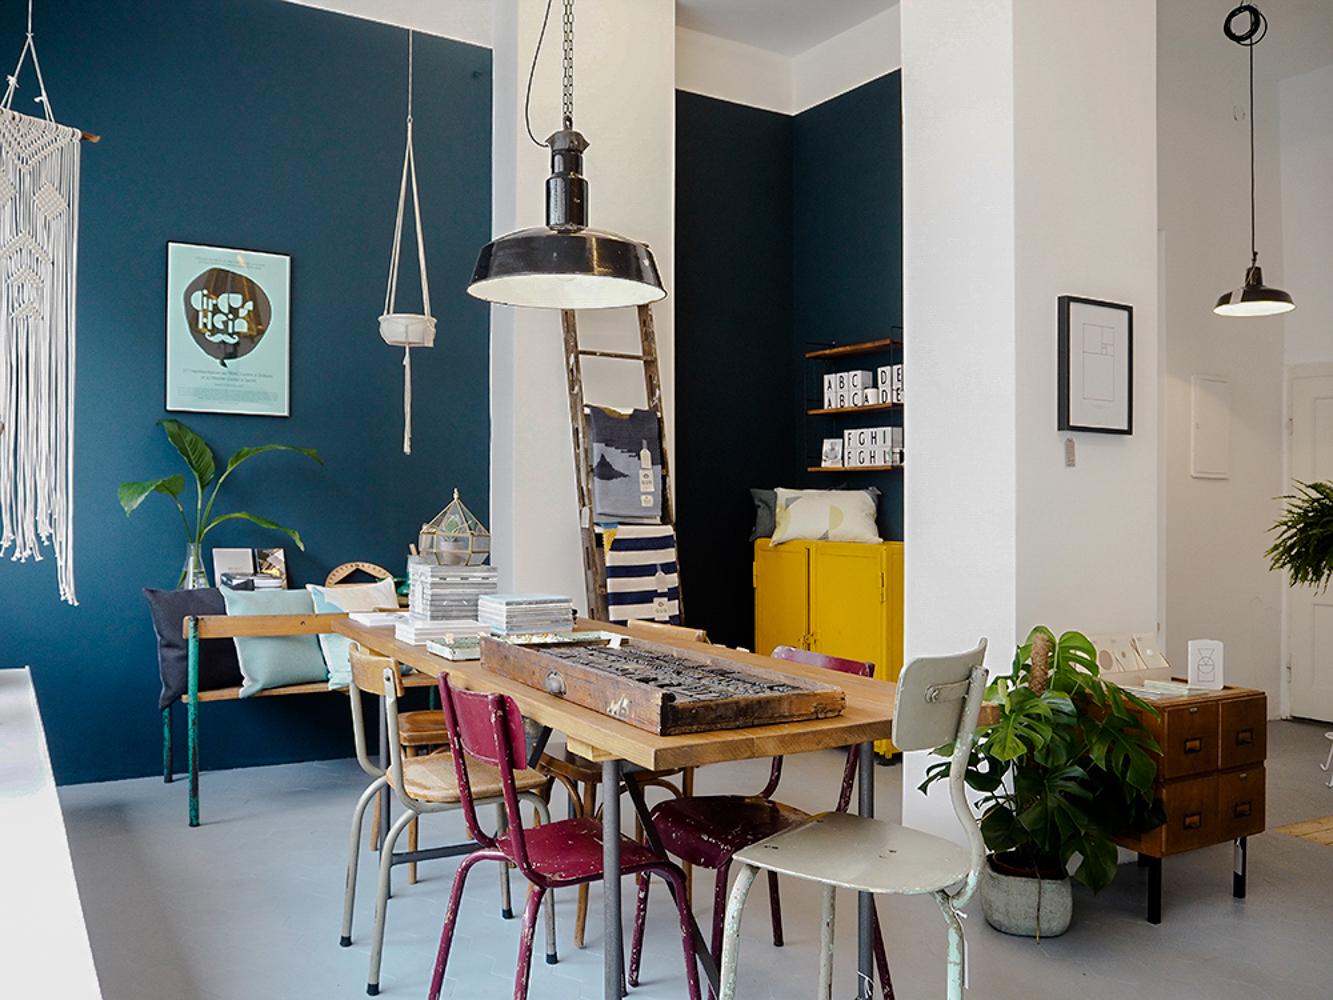 blaue wandfarbe awesome blaue wandfarbe with blaue. Black Bedroom Furniture Sets. Home Design Ideas